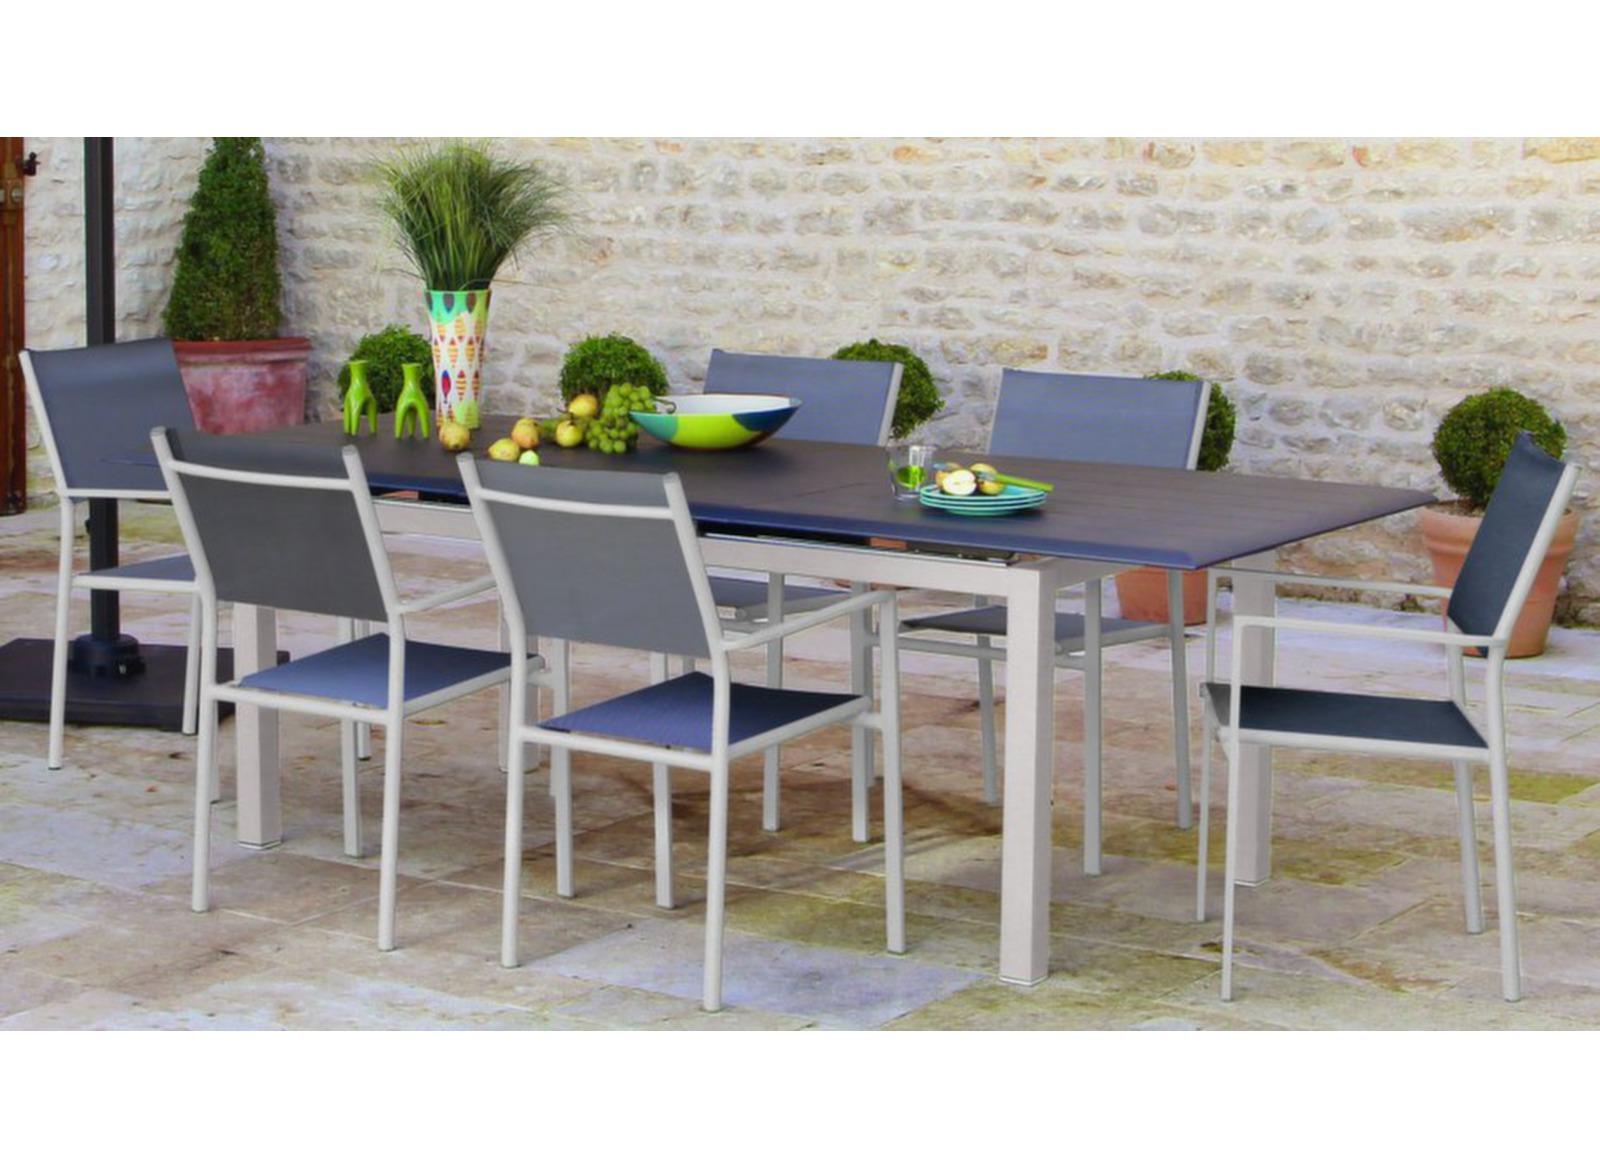 grande table de jardin look bois louisiane proloisirs. Black Bedroom Furniture Sets. Home Design Ideas